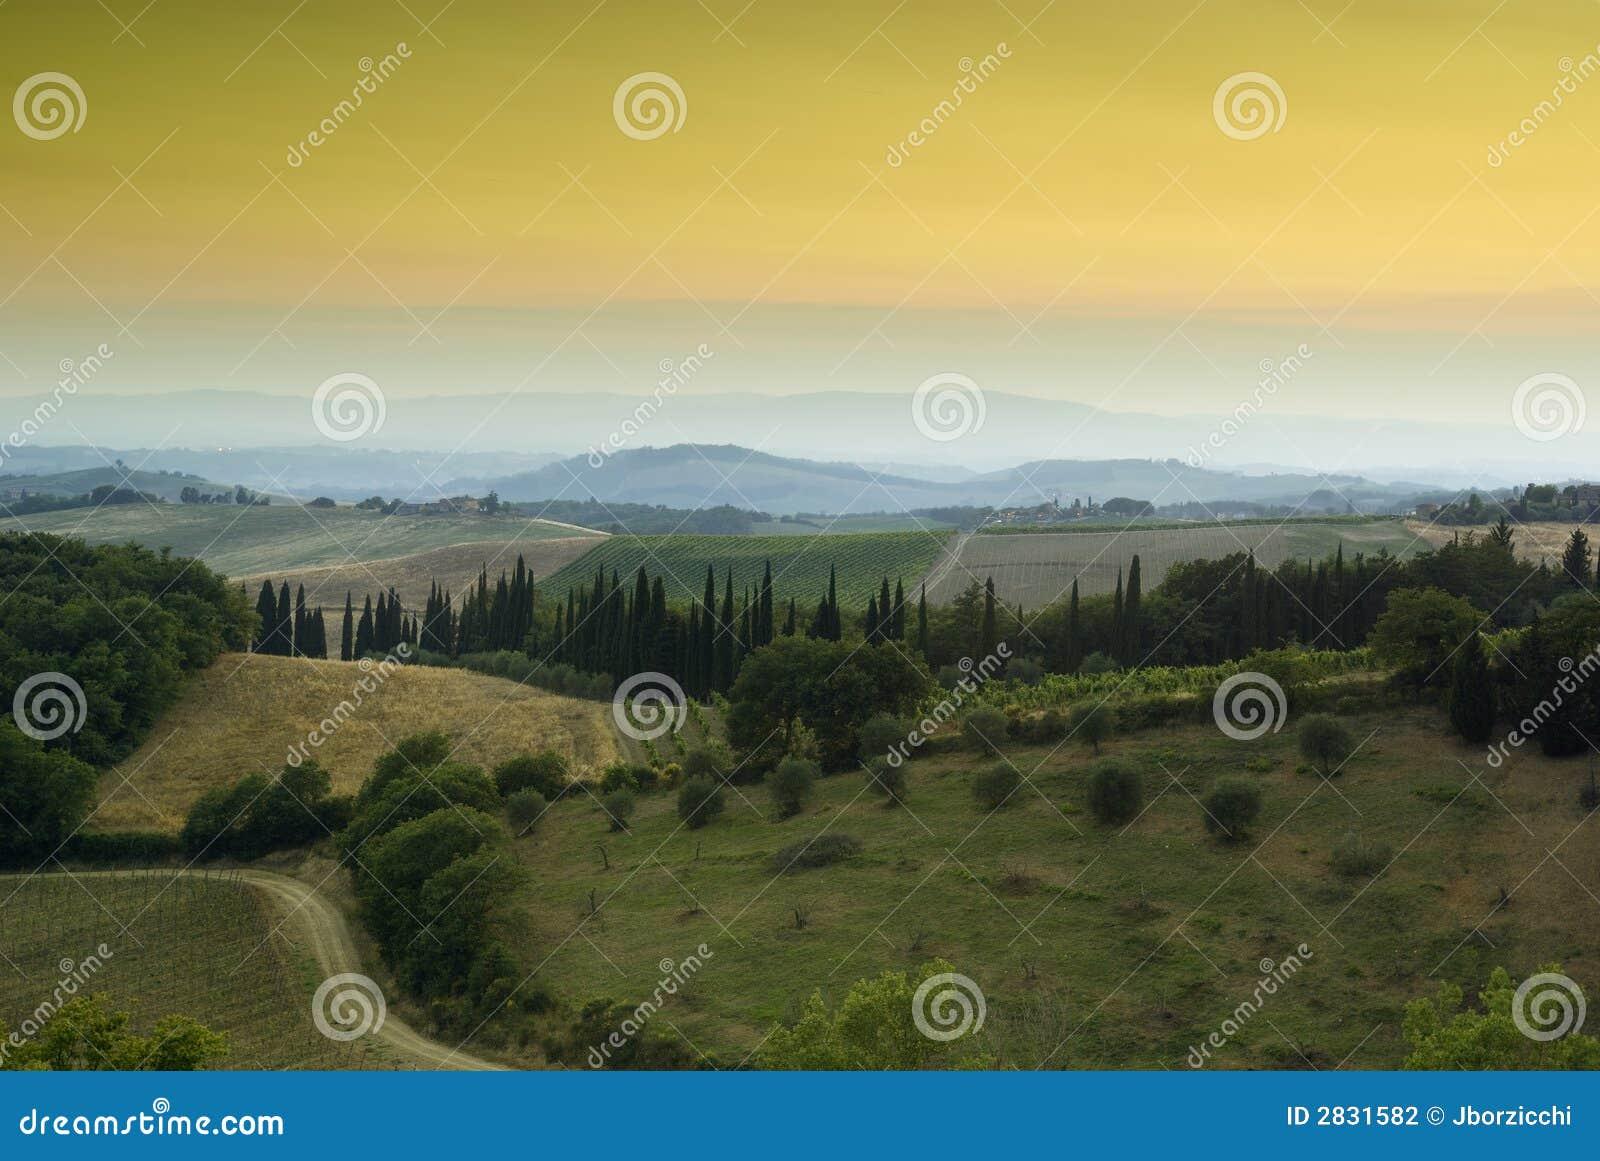 Sunset in Chianti, Tuscany